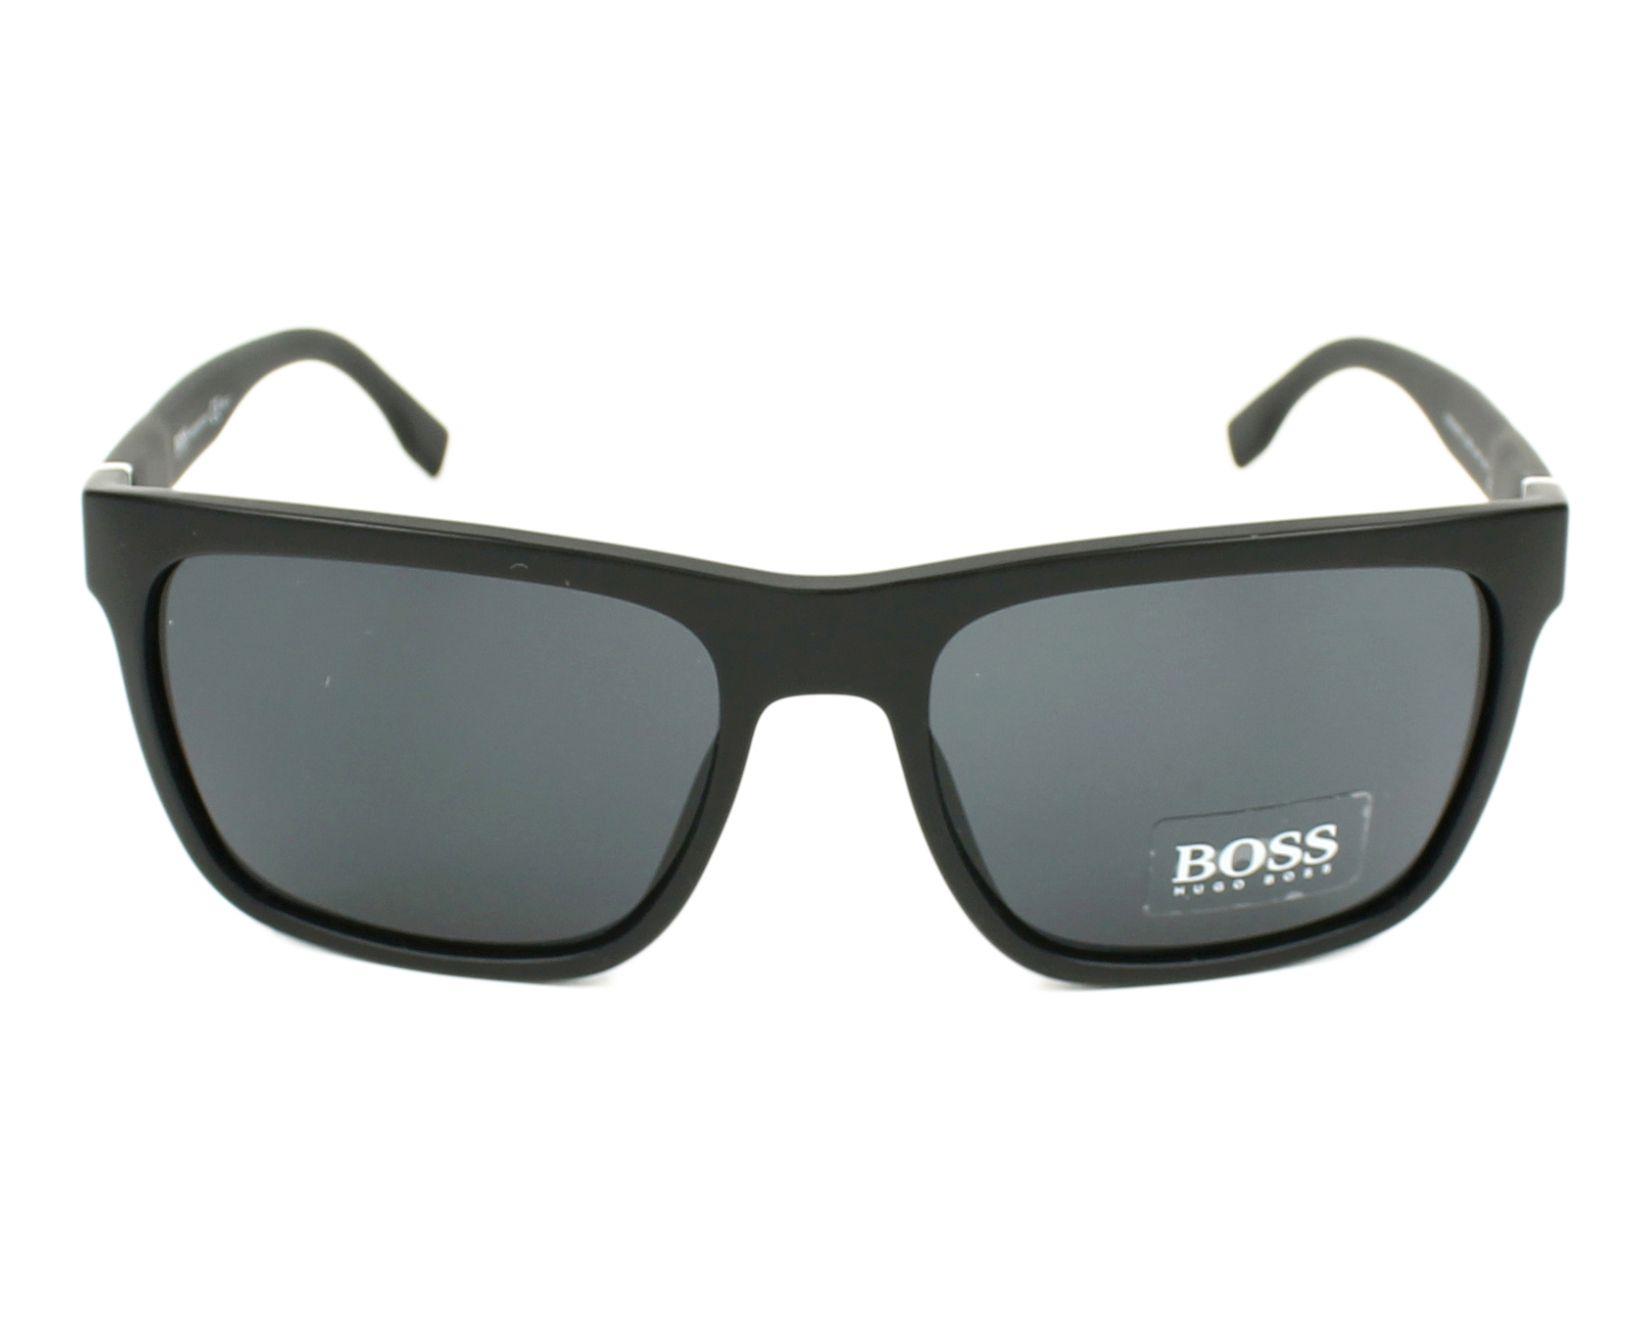 79f33d80d5273 Sunglasses Hugo Boss BOSS-0918-S DL5 IR 56-18 Black Black